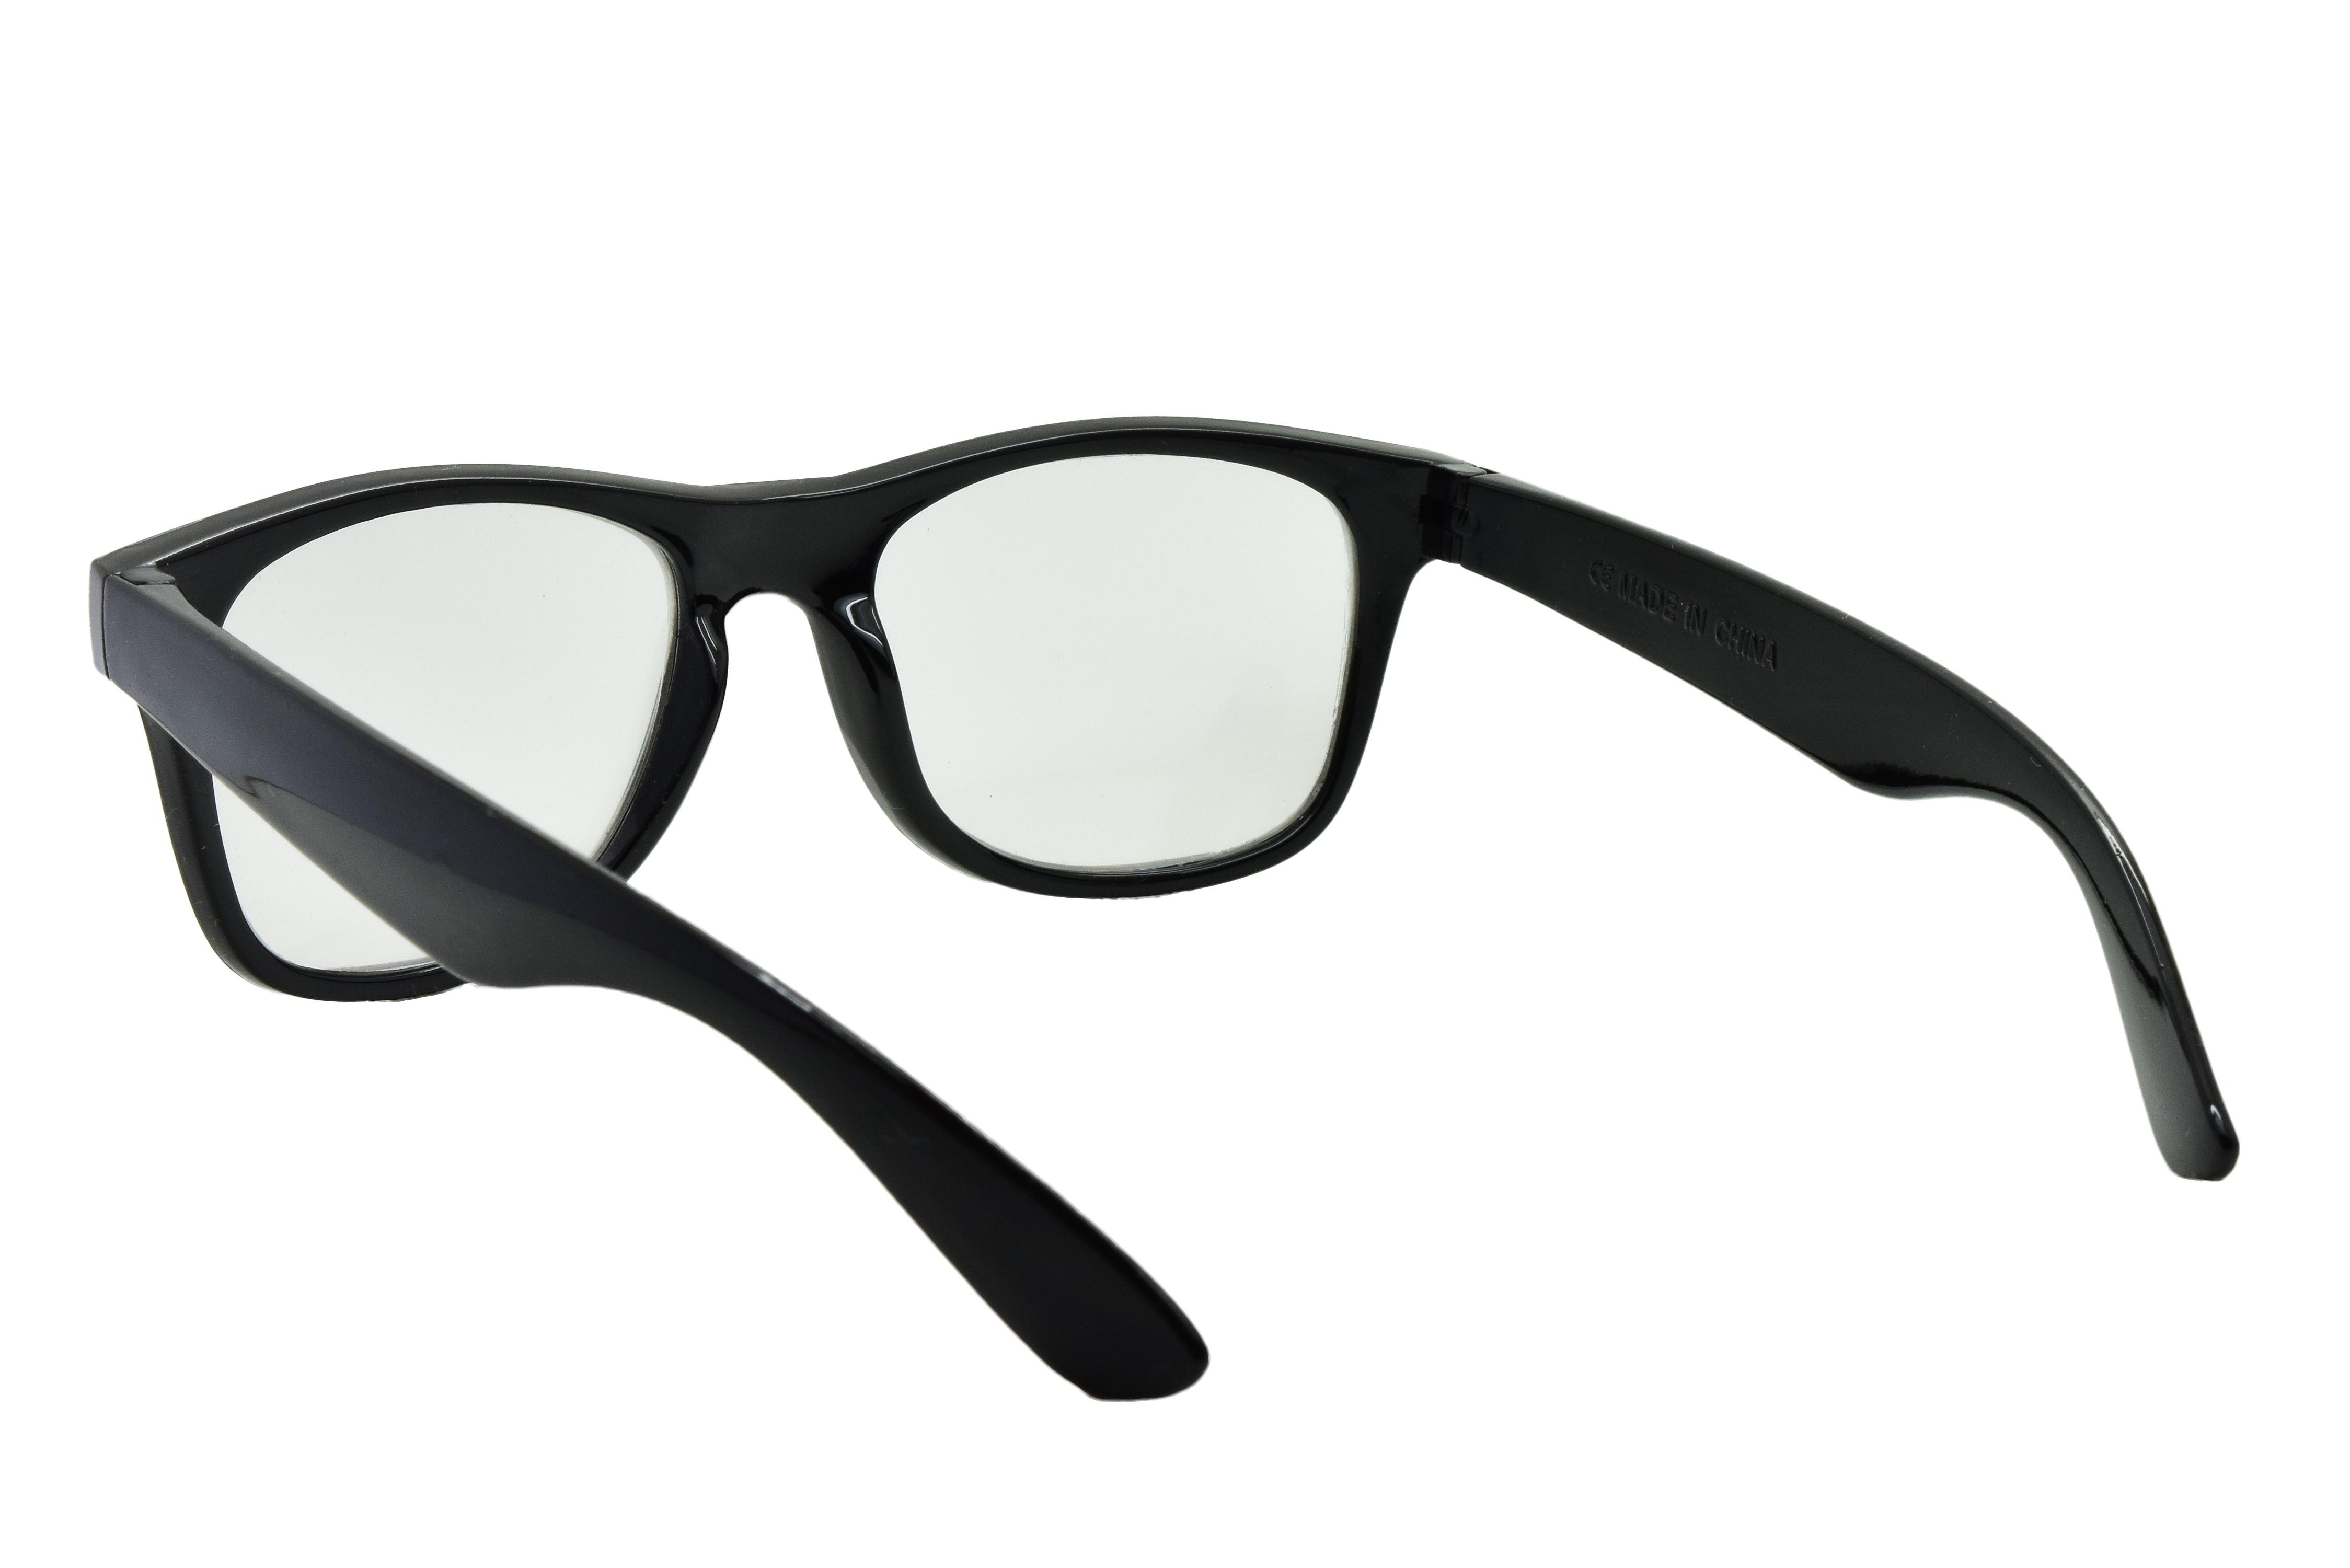 ASVP-Shop-Ultimate-Diffraction-Glasses Indexbild 5